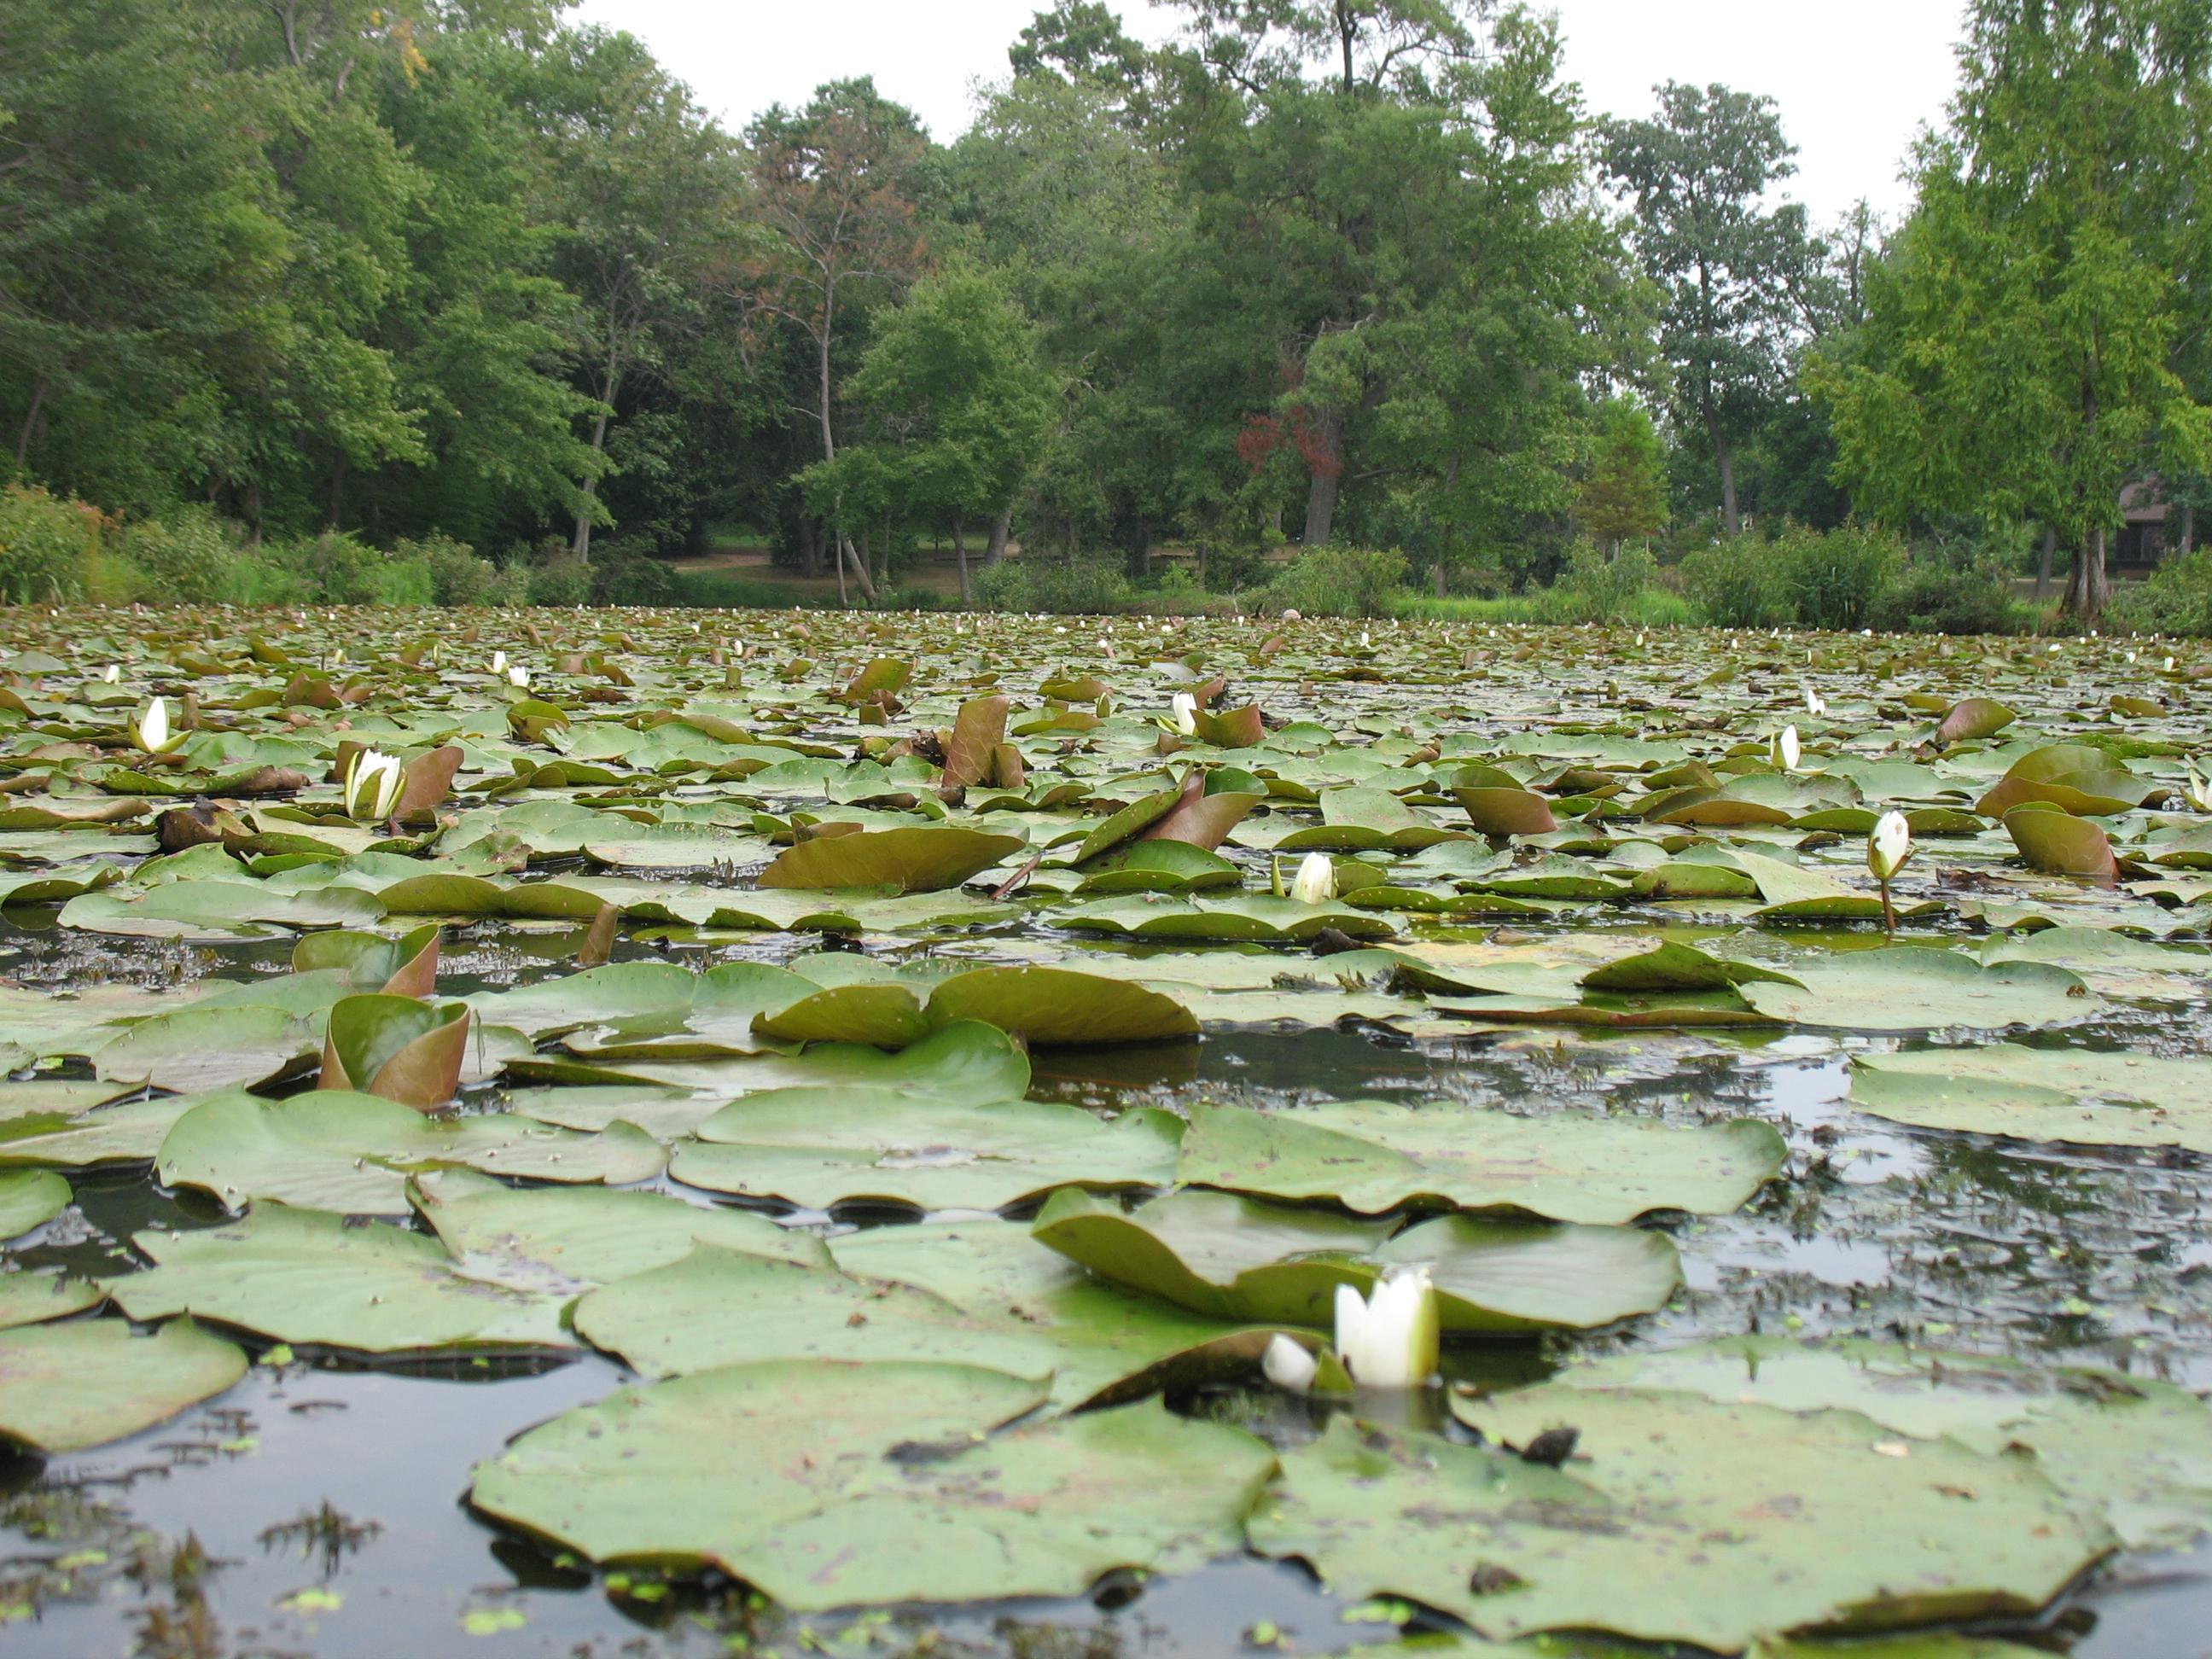 FileKenilworth Aquatic Gardens g Wikimedia mons